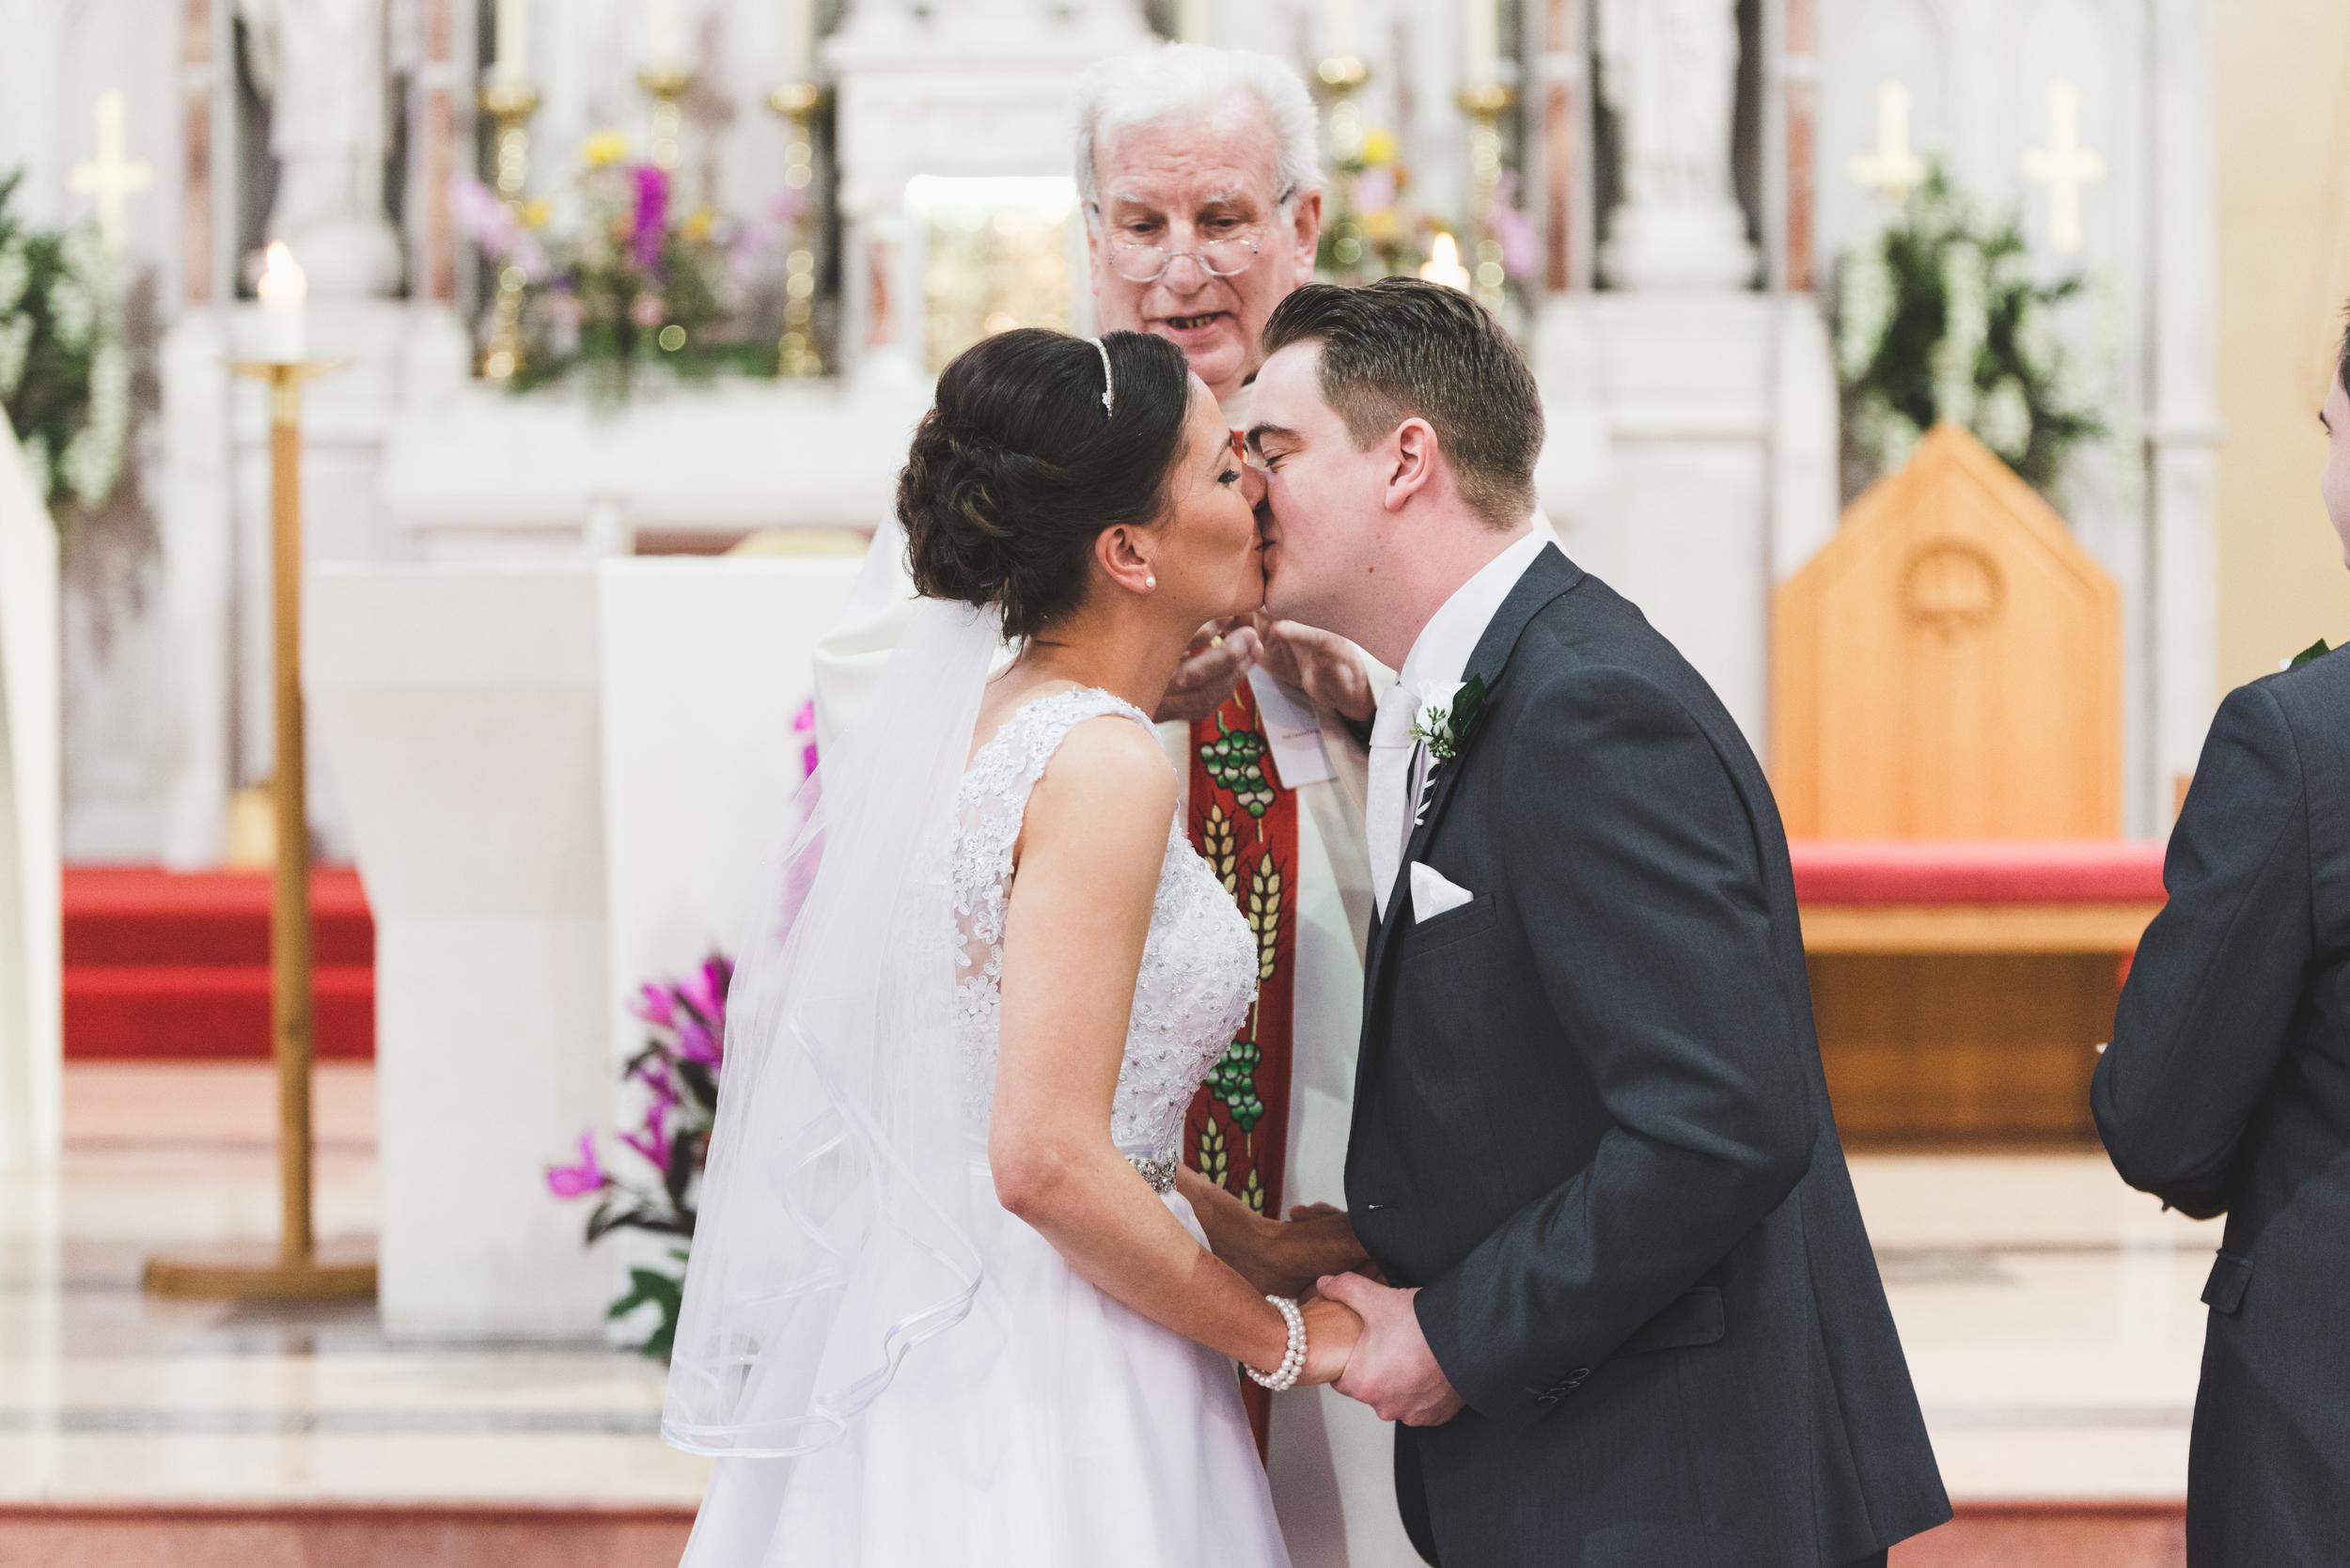 Lisburn_Wedding_Photographer_The_Groom_and_Bride_Kiss